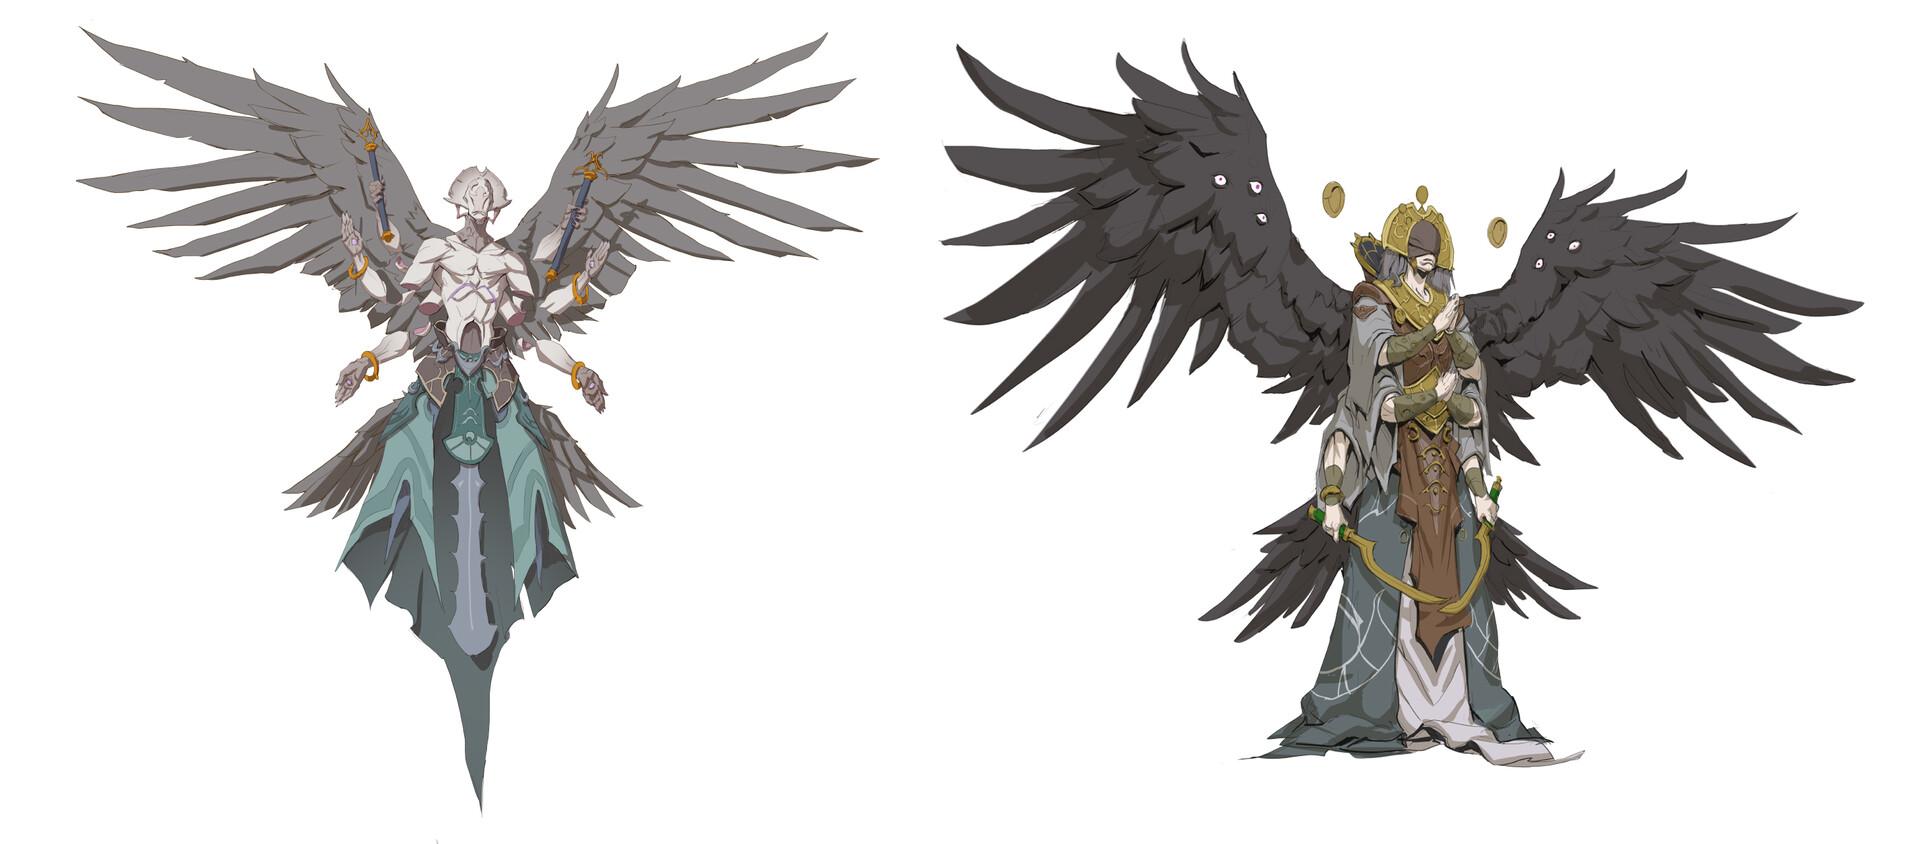 Jordy knoop angel of death flats